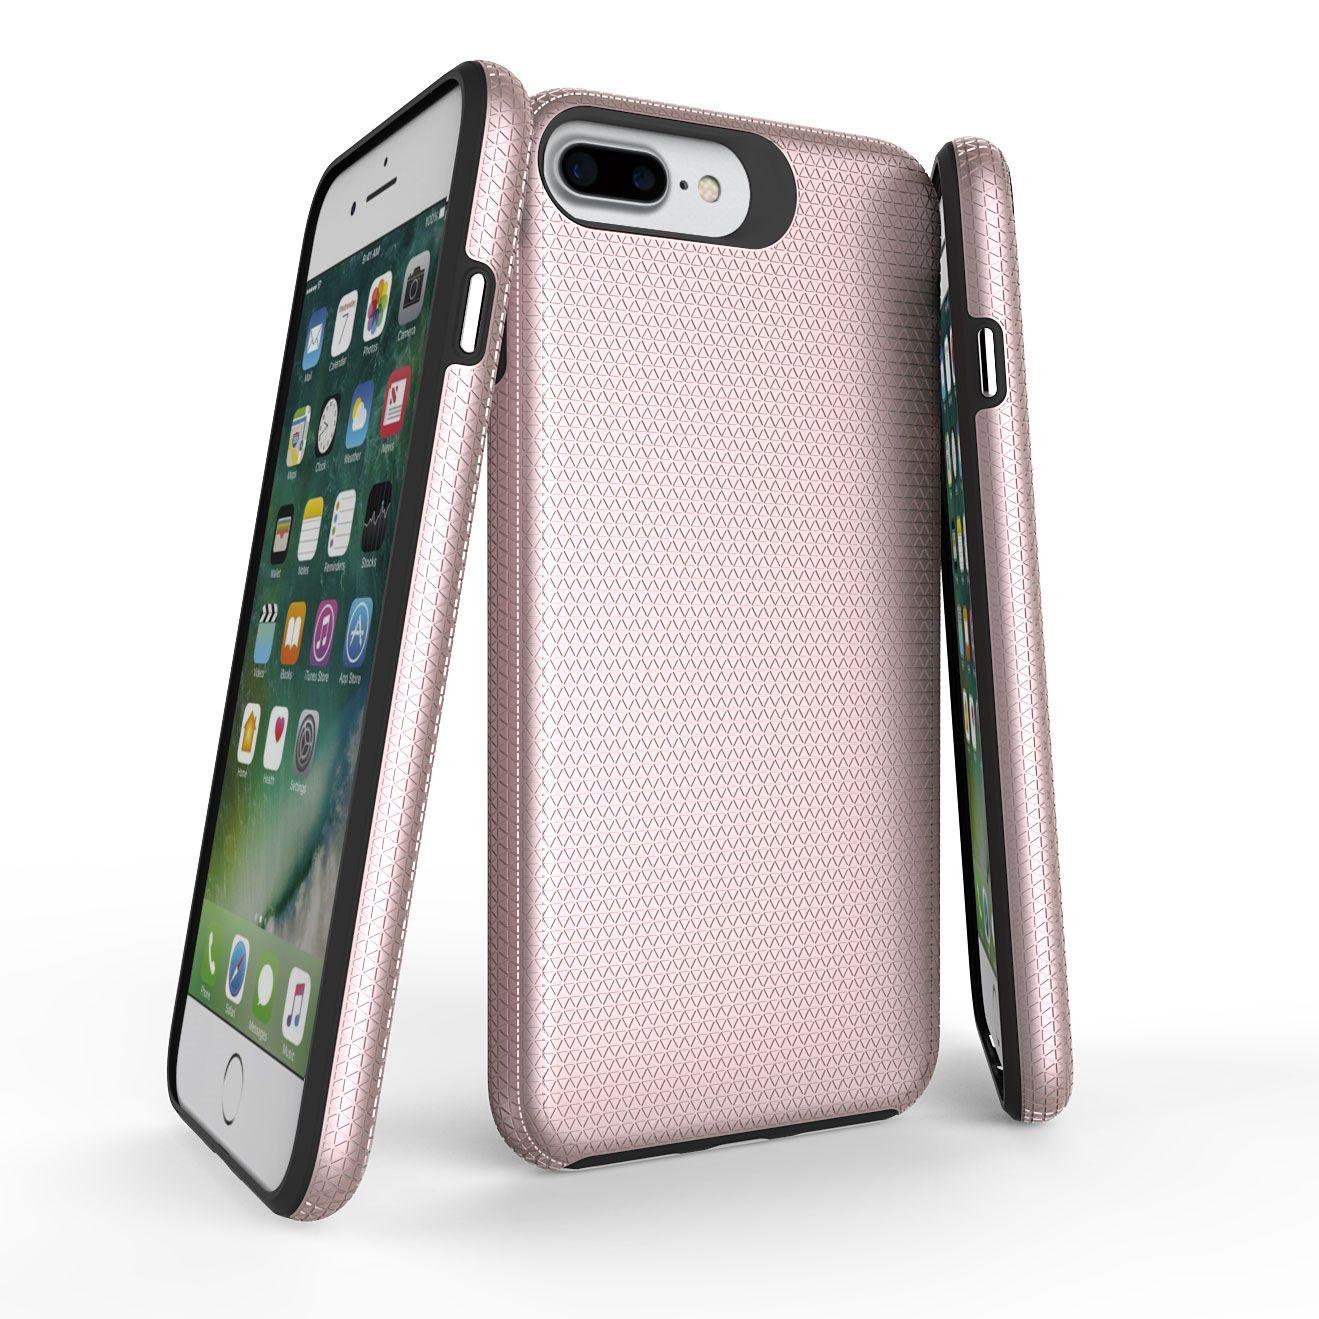 Funda de armadura de doble capa para Samsung Galaxy S10 5G S10e iphone 6 6s 7 8 Plus X Xs Max XR Cubierta de metal incorporada